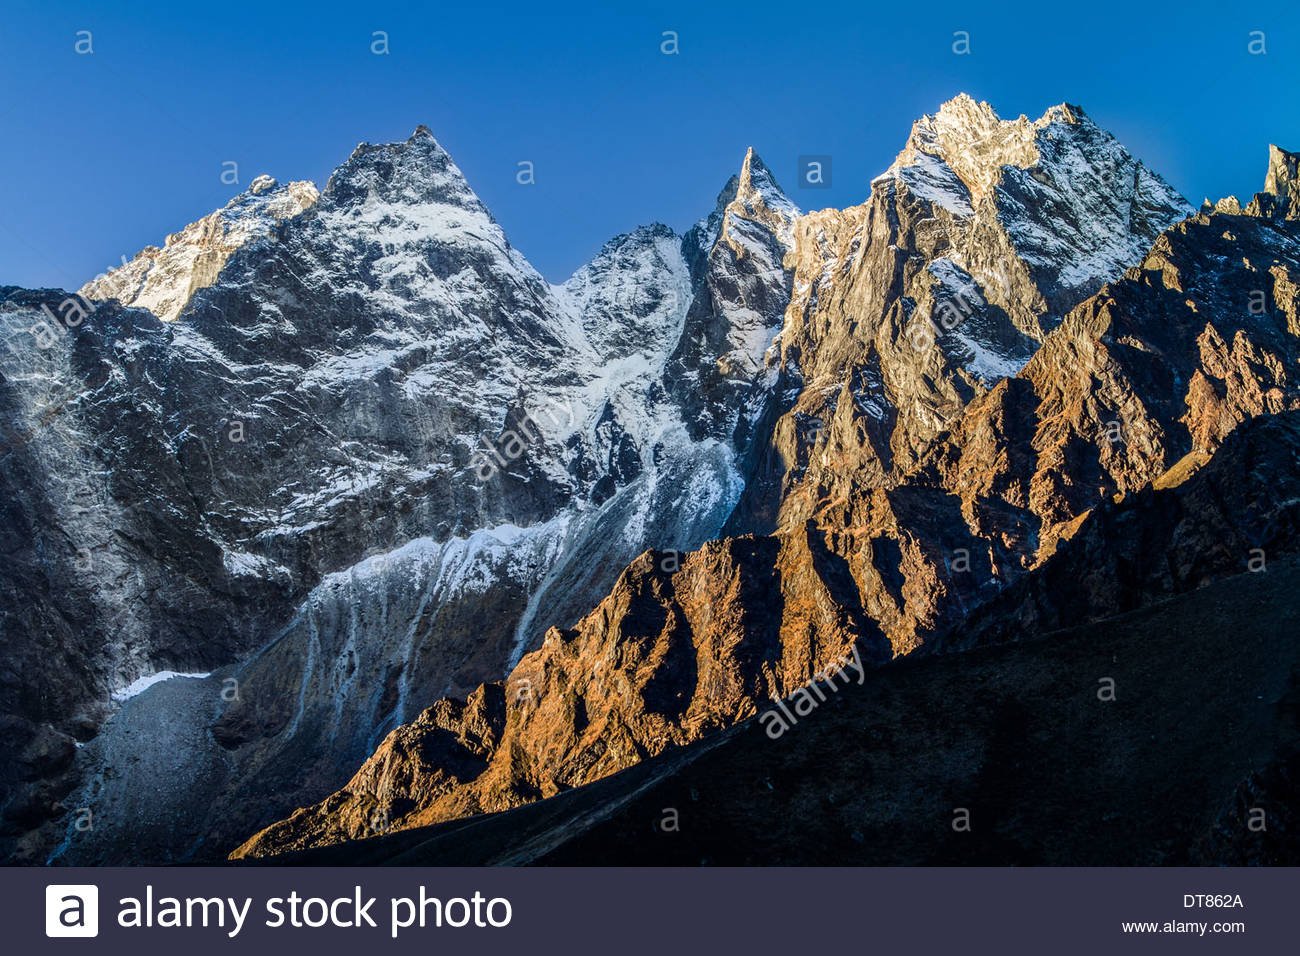 Jagged Himalayas At Sunrise, Nepal - Stock Image